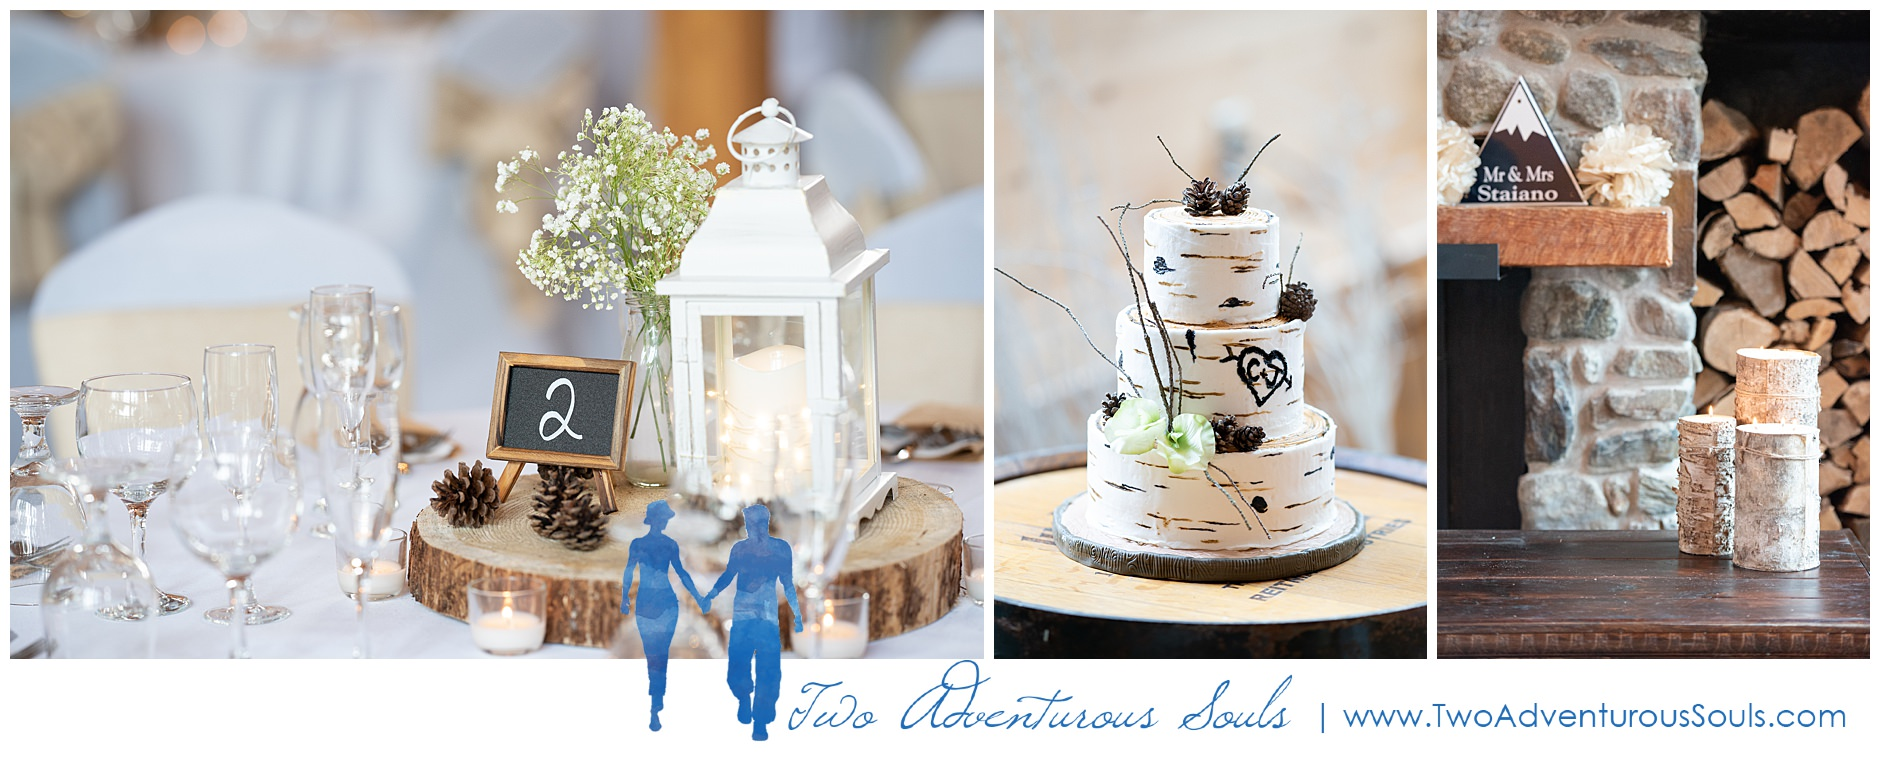 Sugarloaf Outdoor Center Wedding Photographers, Destination Wedding Photographers, Two Adventurous Souls-081719_0029.jpg